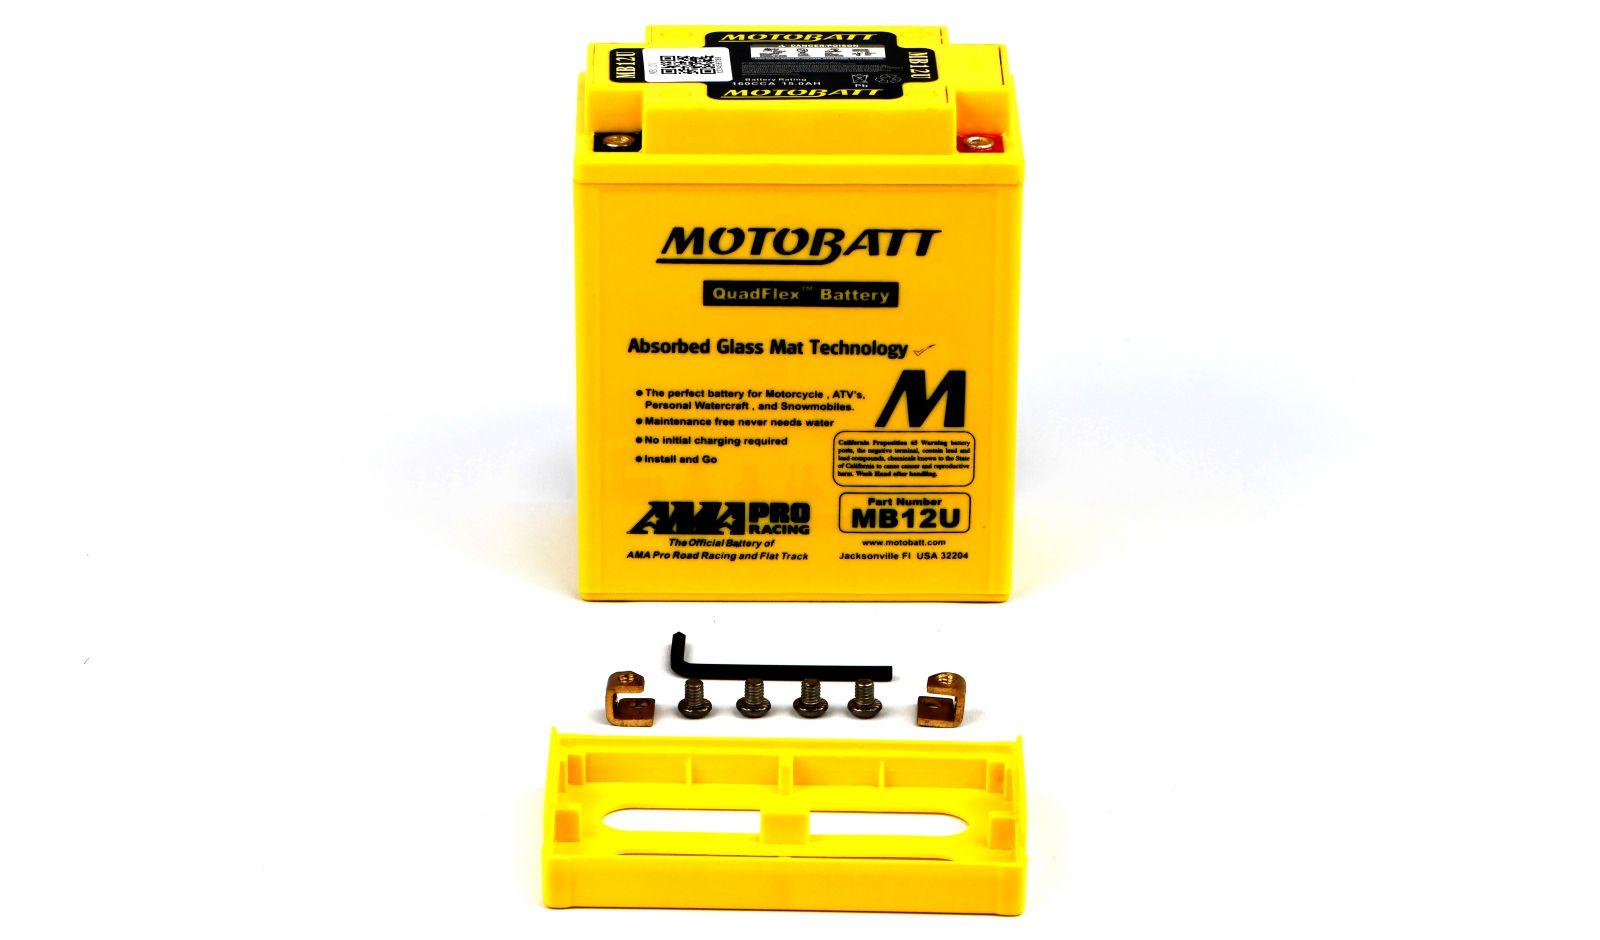 Motobatt Batteries - 501120MY image